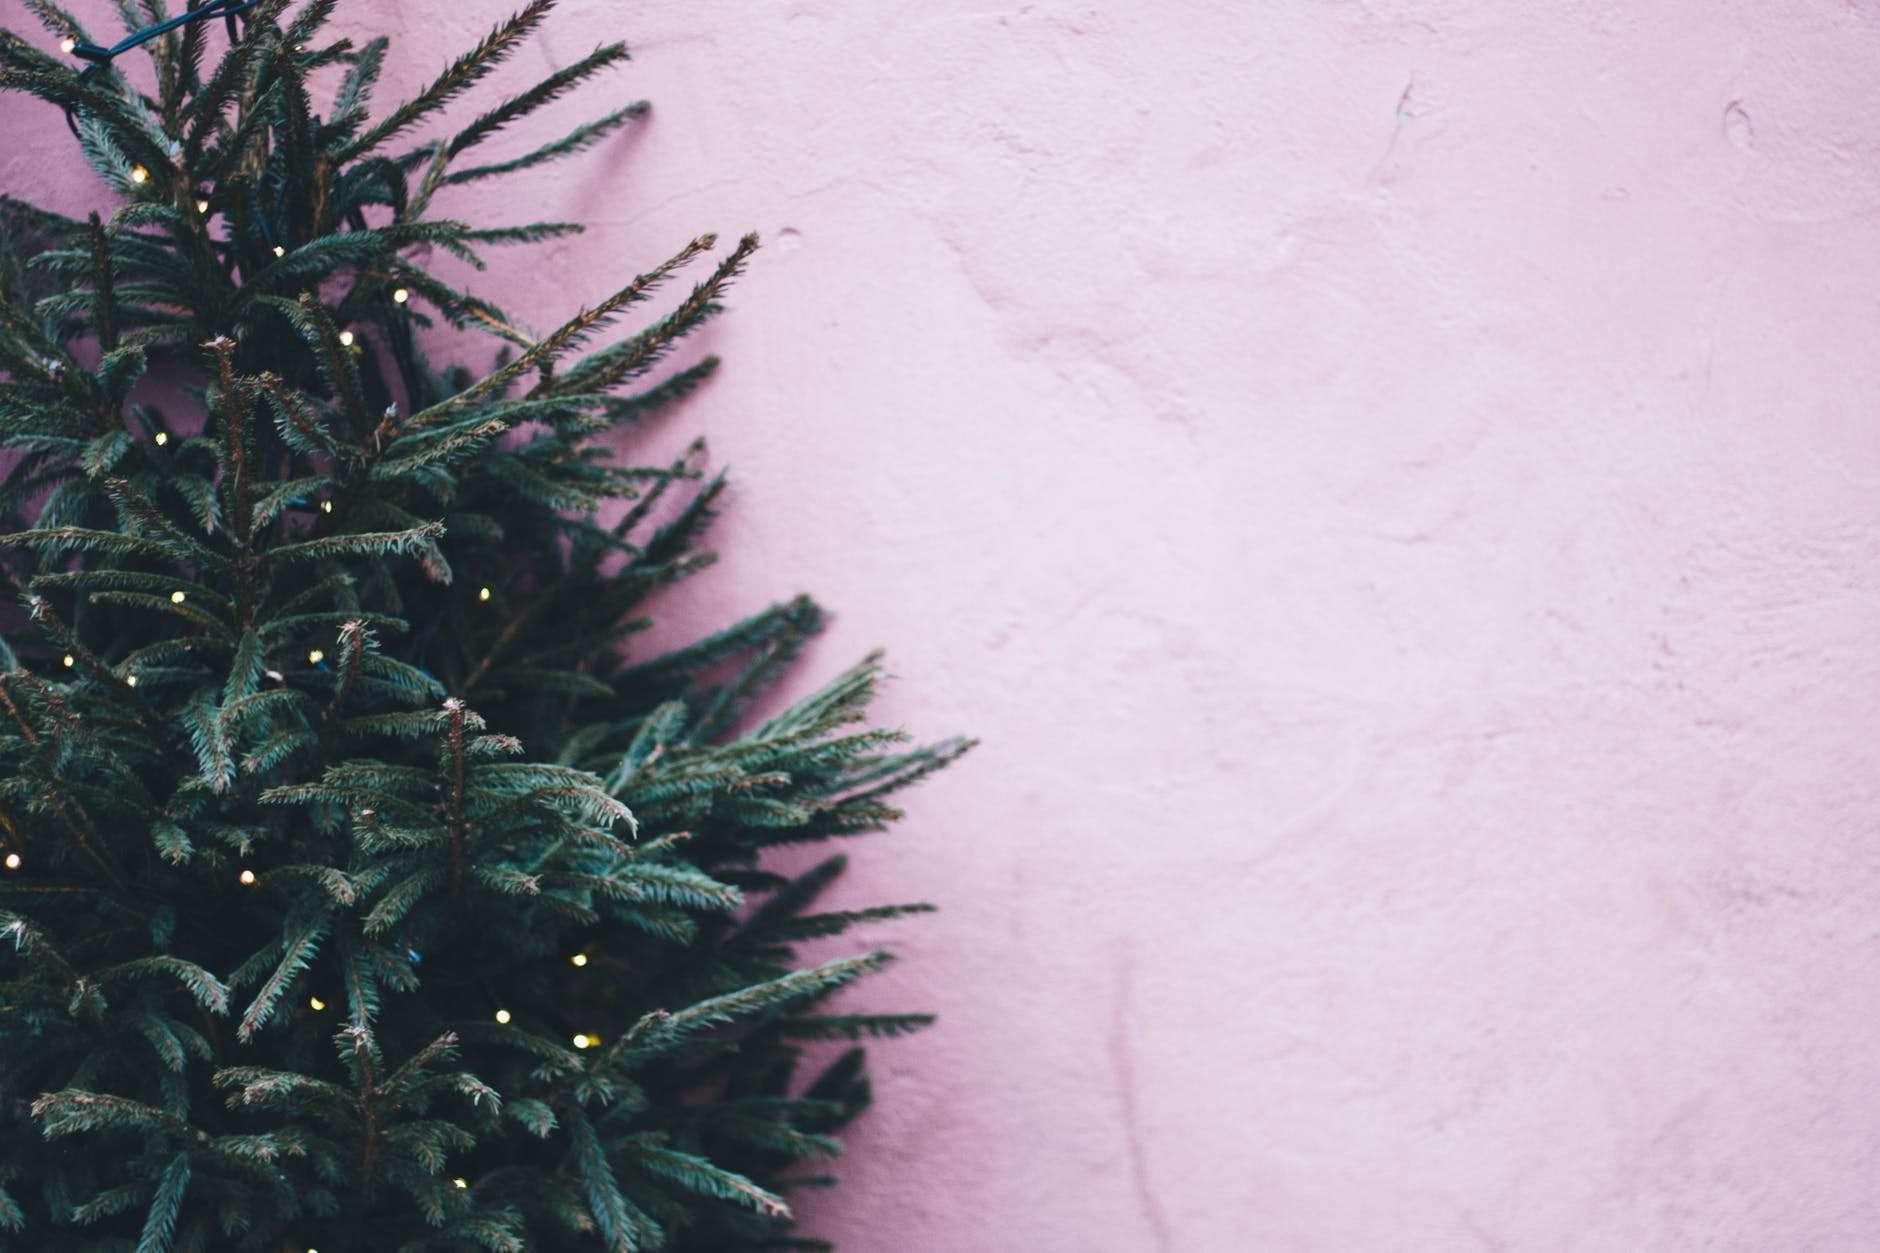 Pondering the Christmas Tree